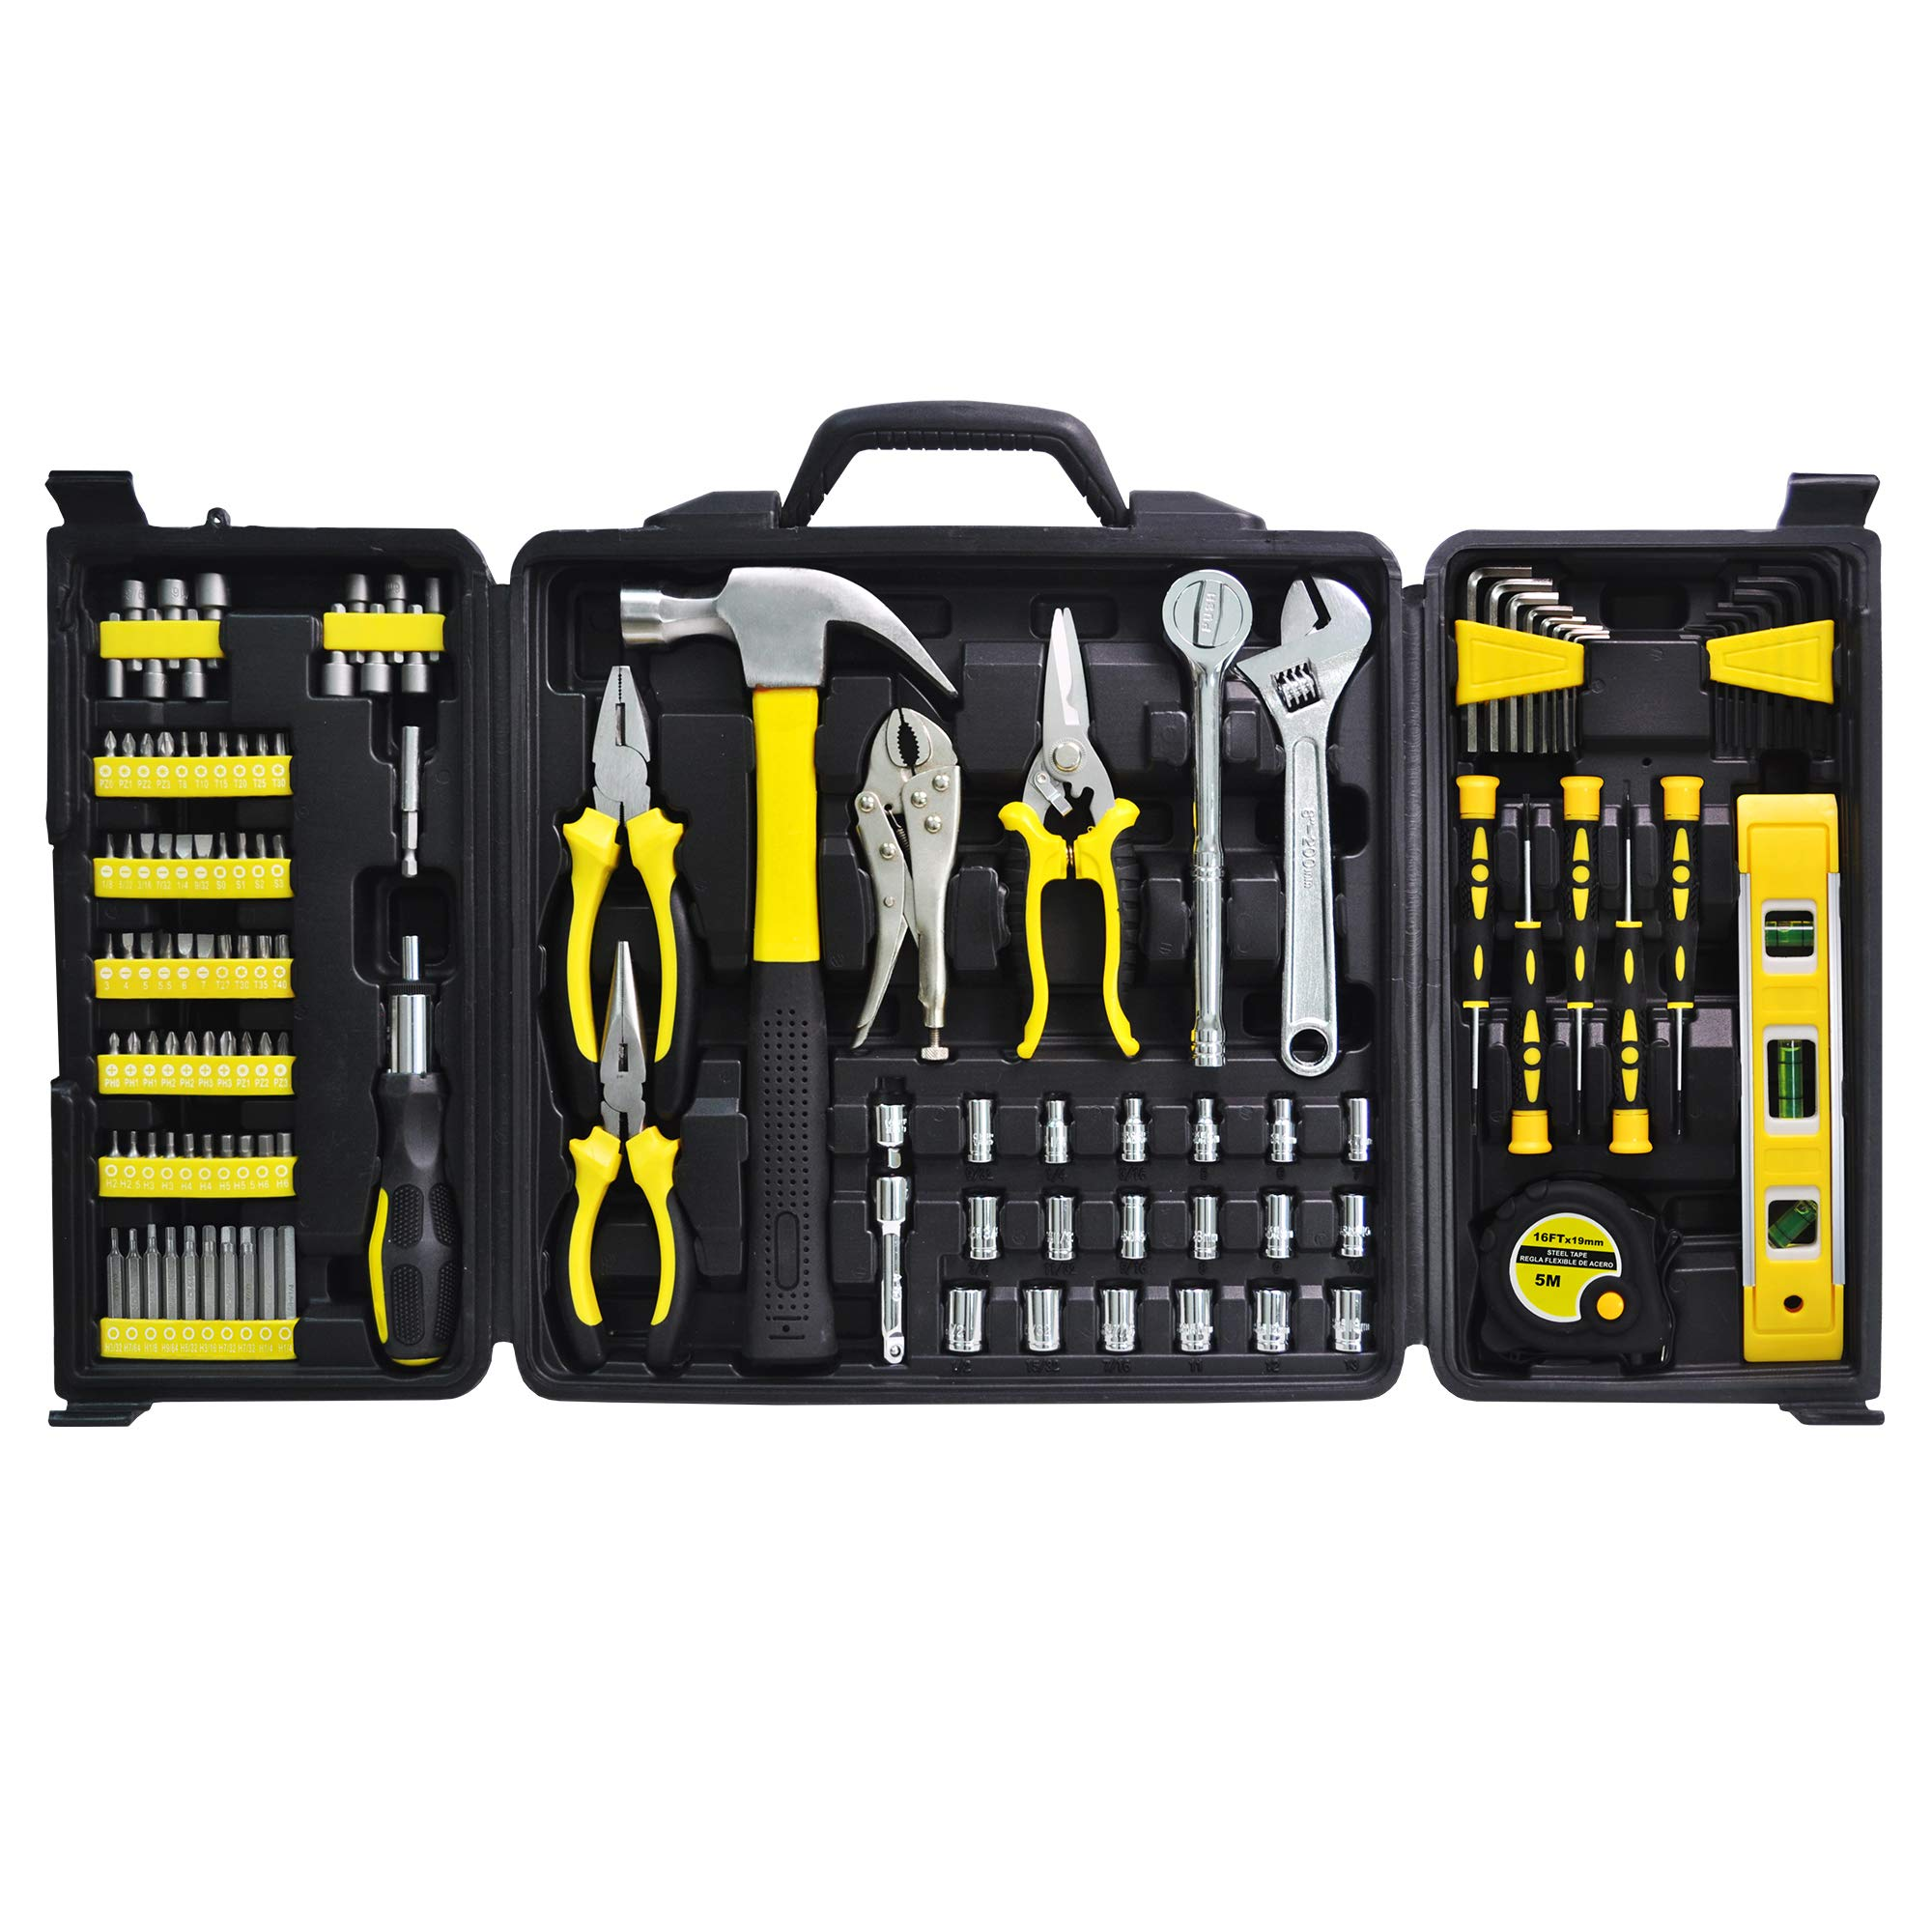 Hand Tool Set, Longmate 124pcs Tool Kits Genaral Mechanic Tool Set with Plastic Storage Case